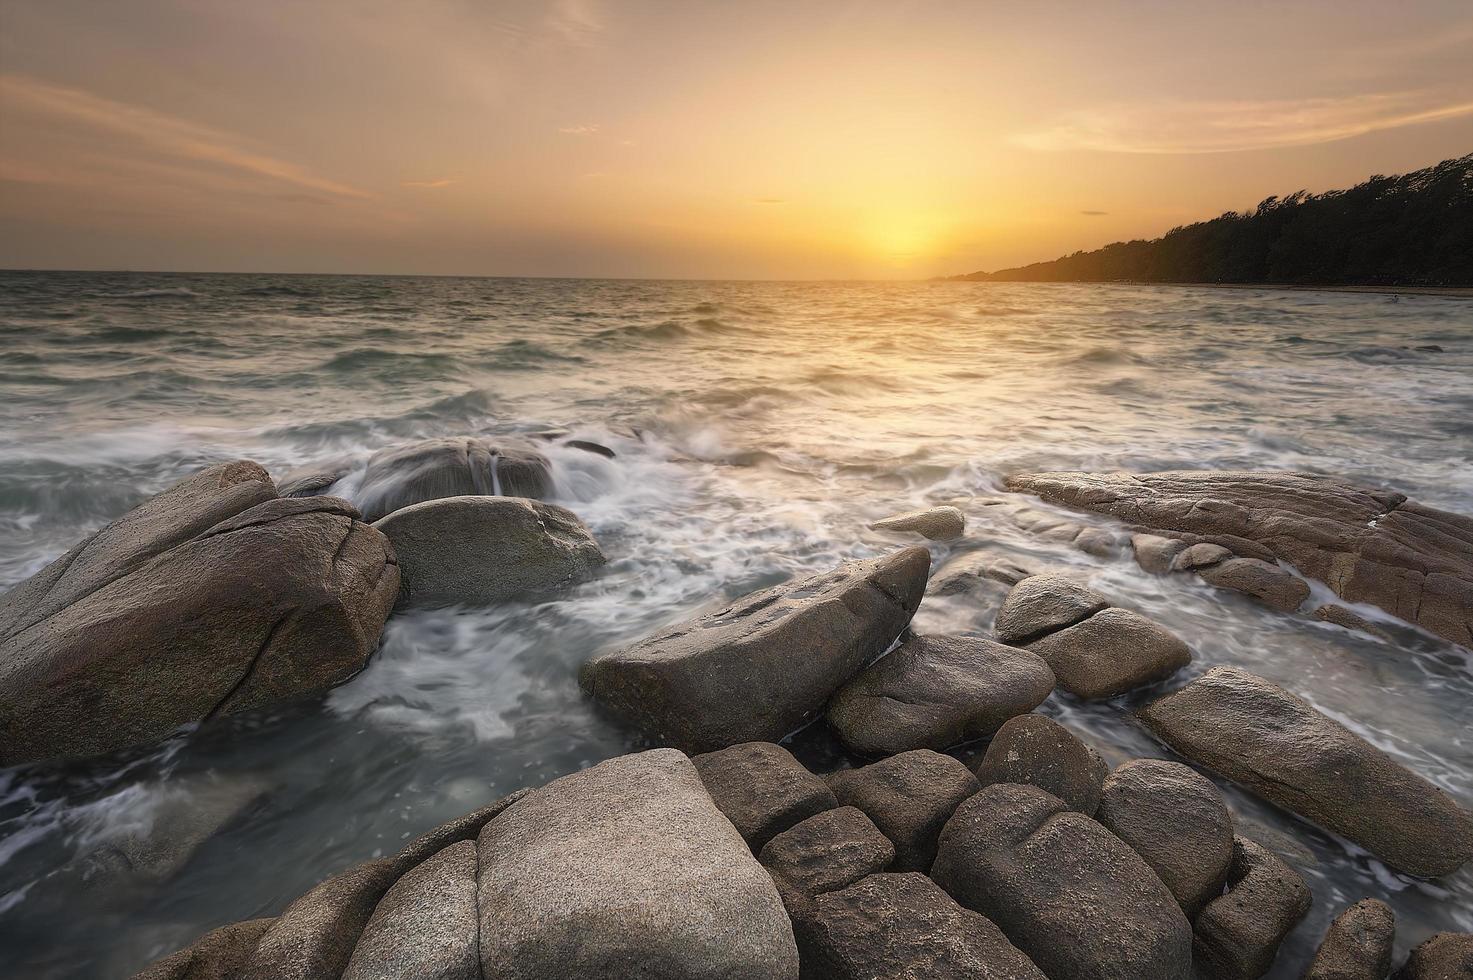 Beautiful summer seascape photo